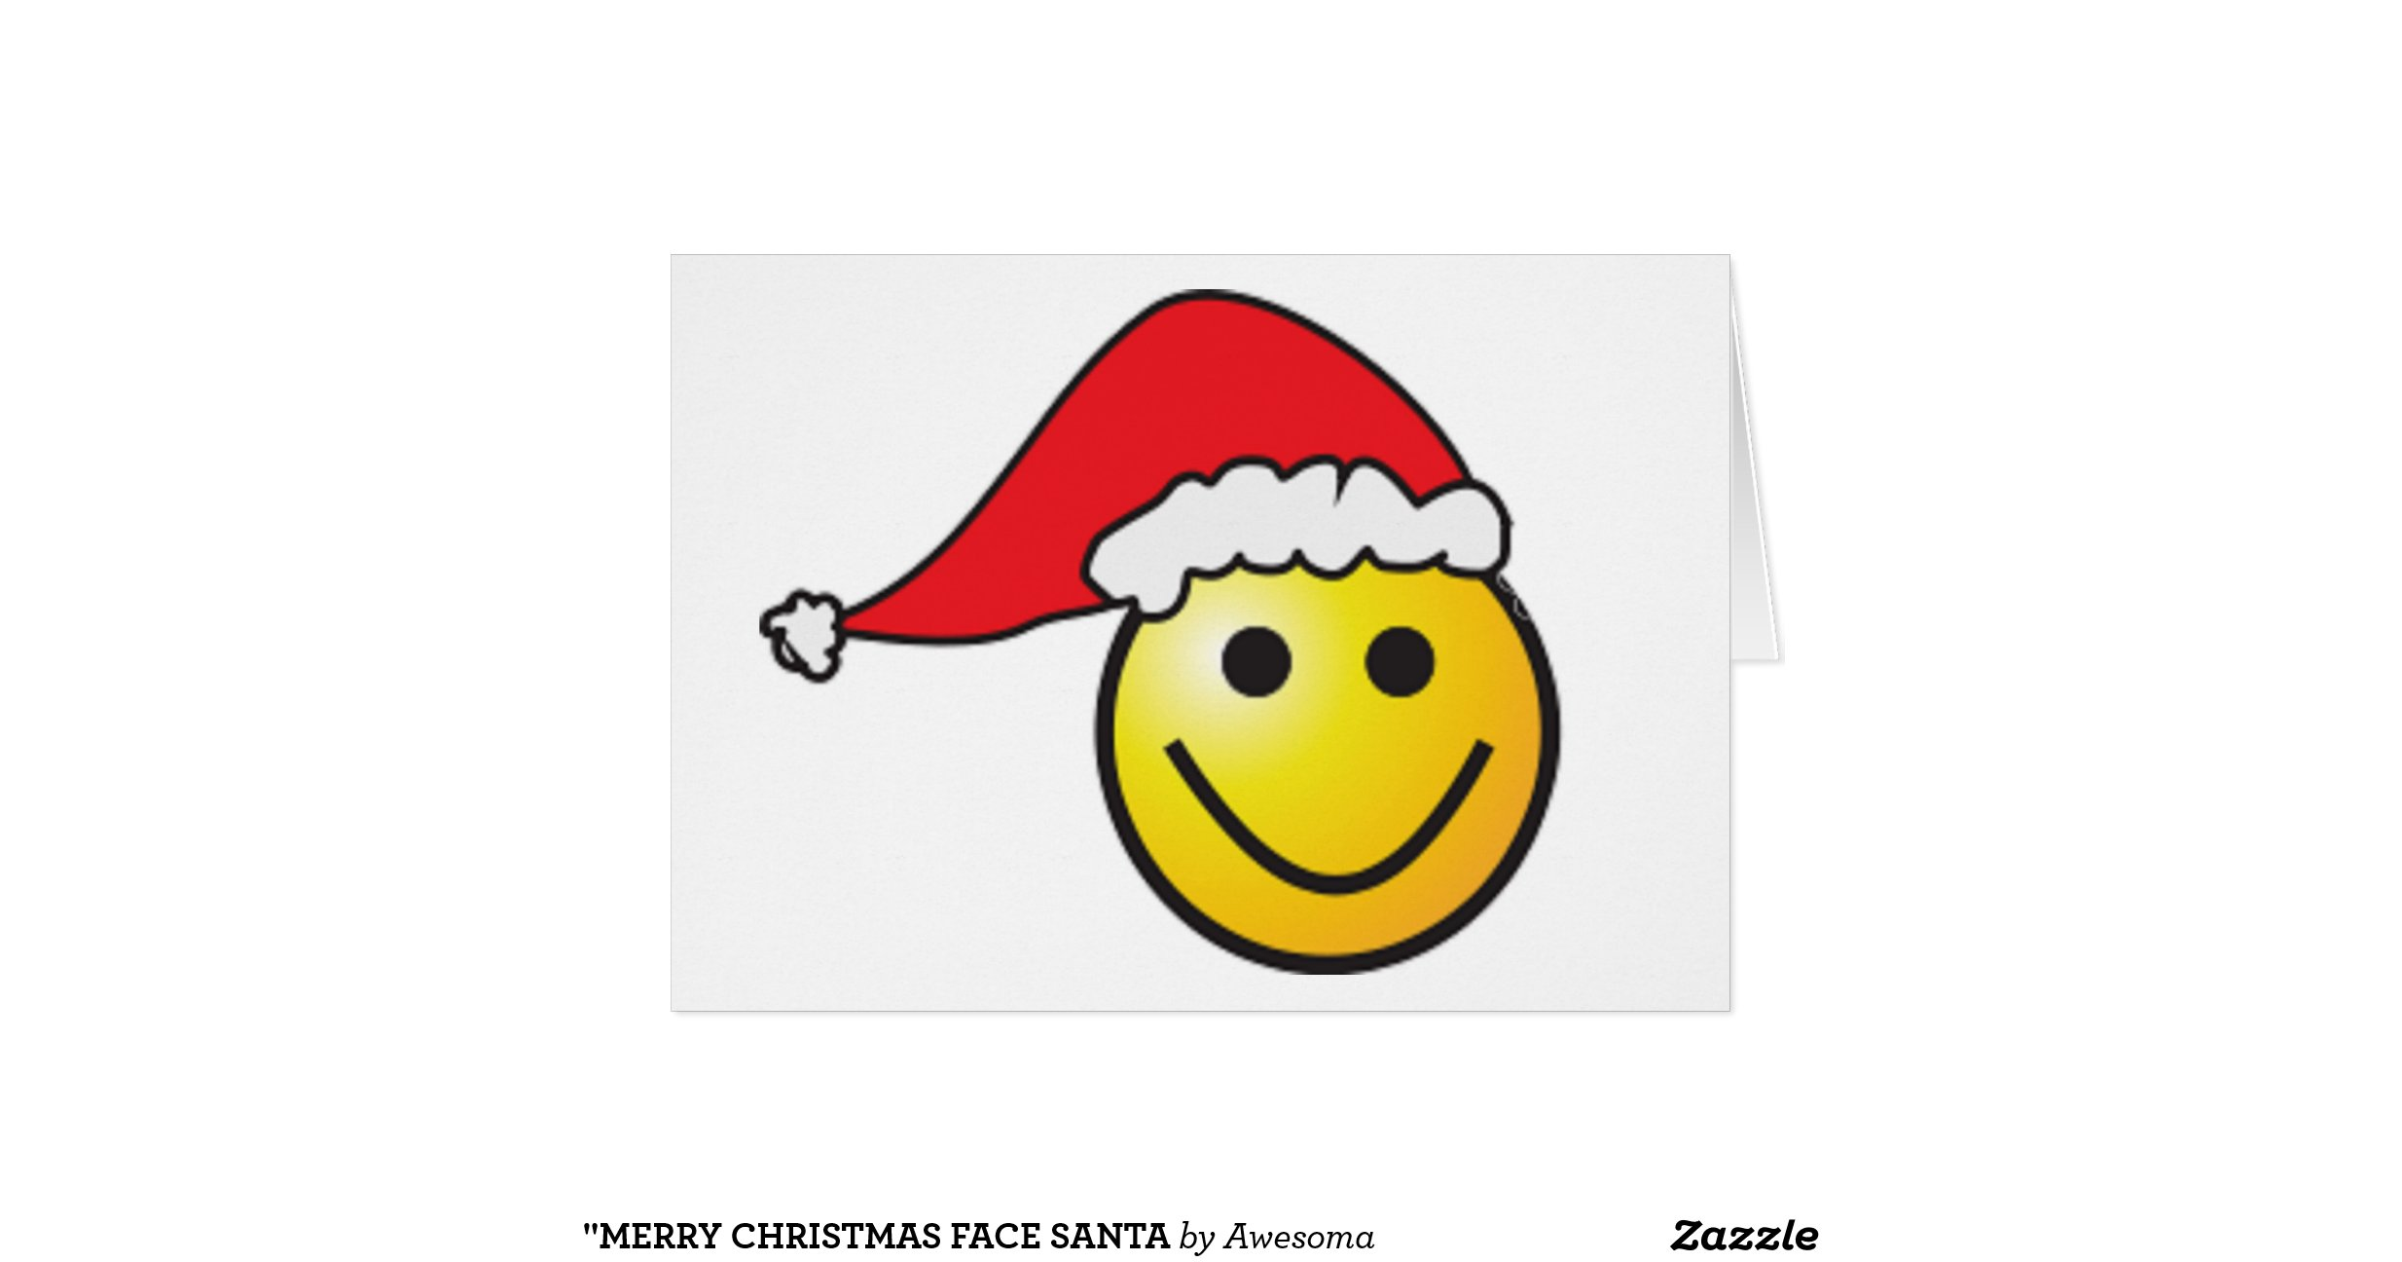 """MERRY CHRISTMAS"" SMILEY FACE SANTA GREETING CARD"